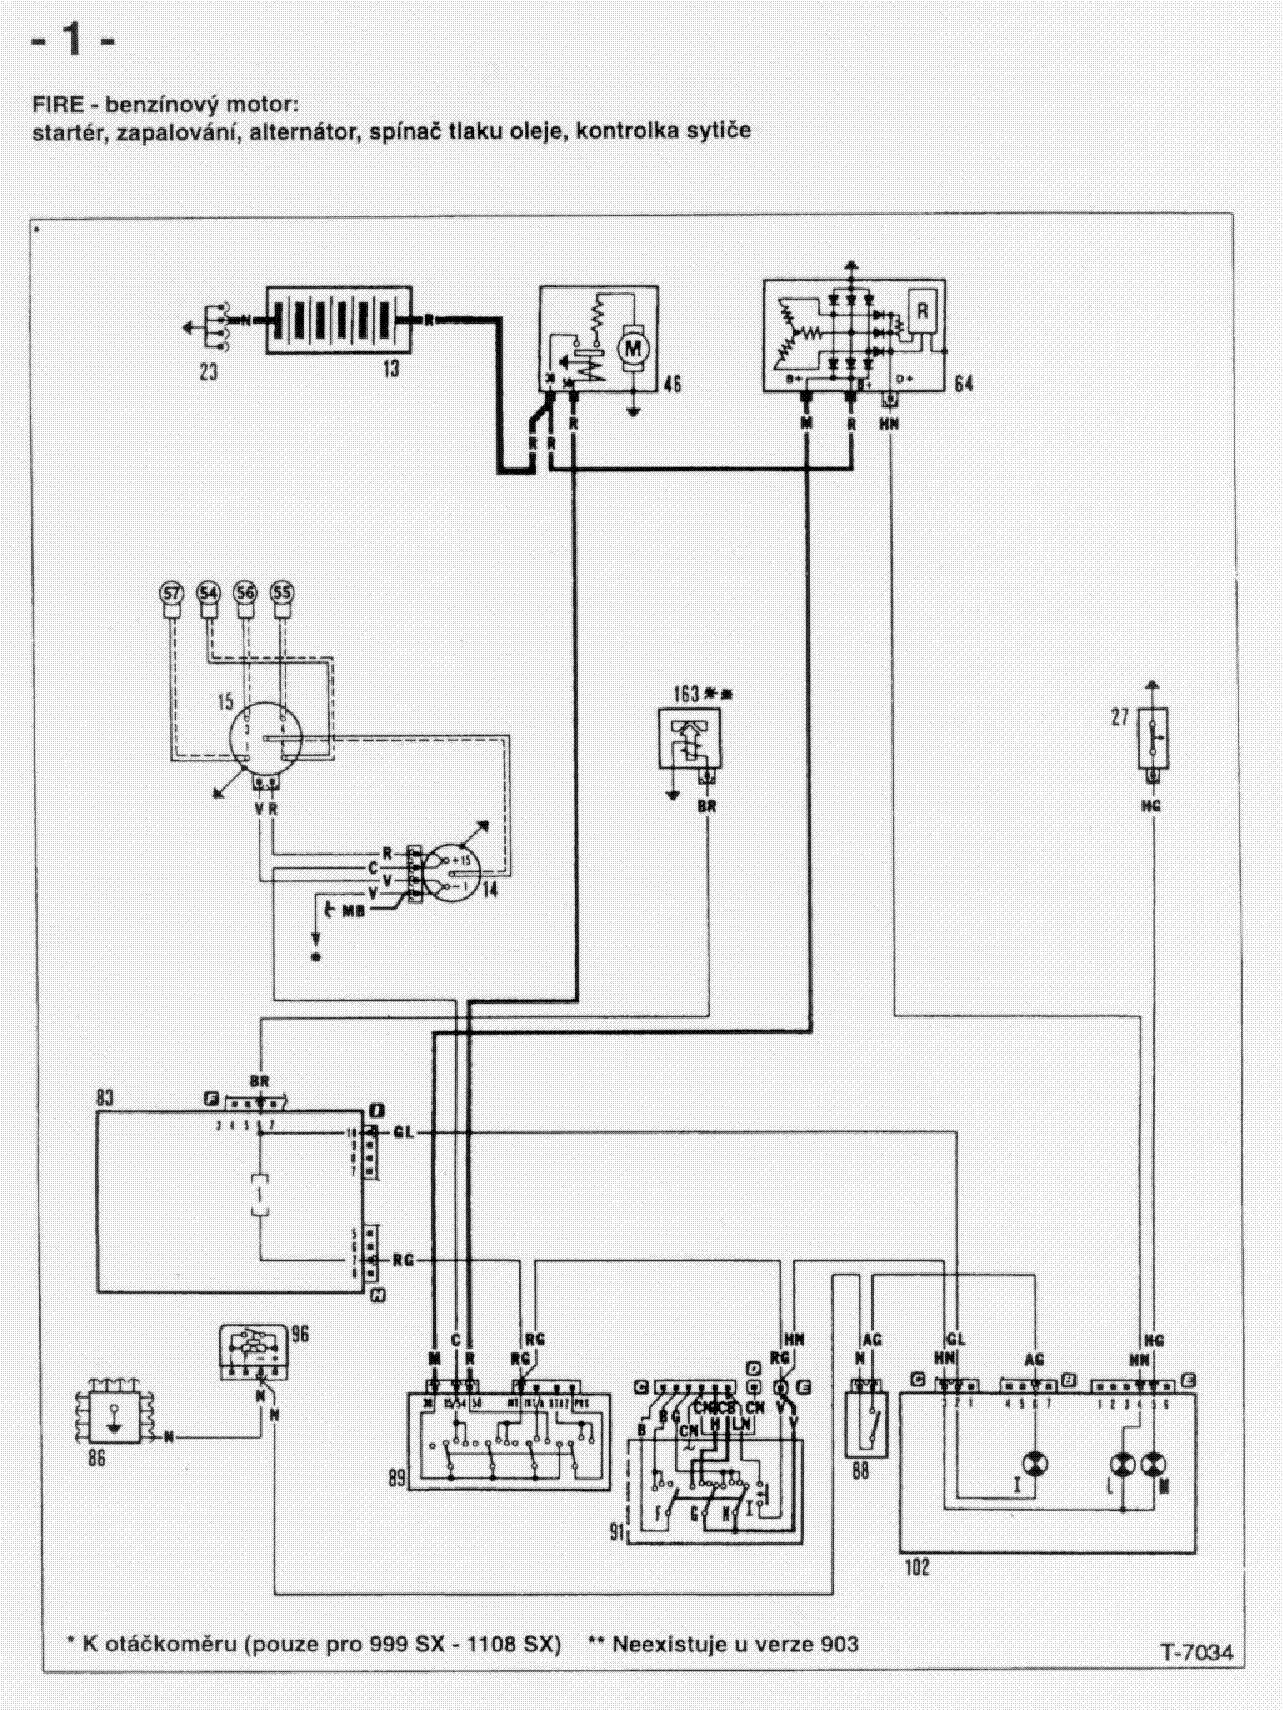 nash-metropolitan-wiring-diagram-10 Wiring Diagram For Nash Metropolitan on back seat, convertible blue, car clubs, hood ornament, pic custom, cars sale, street rod, parts car, drag cars,